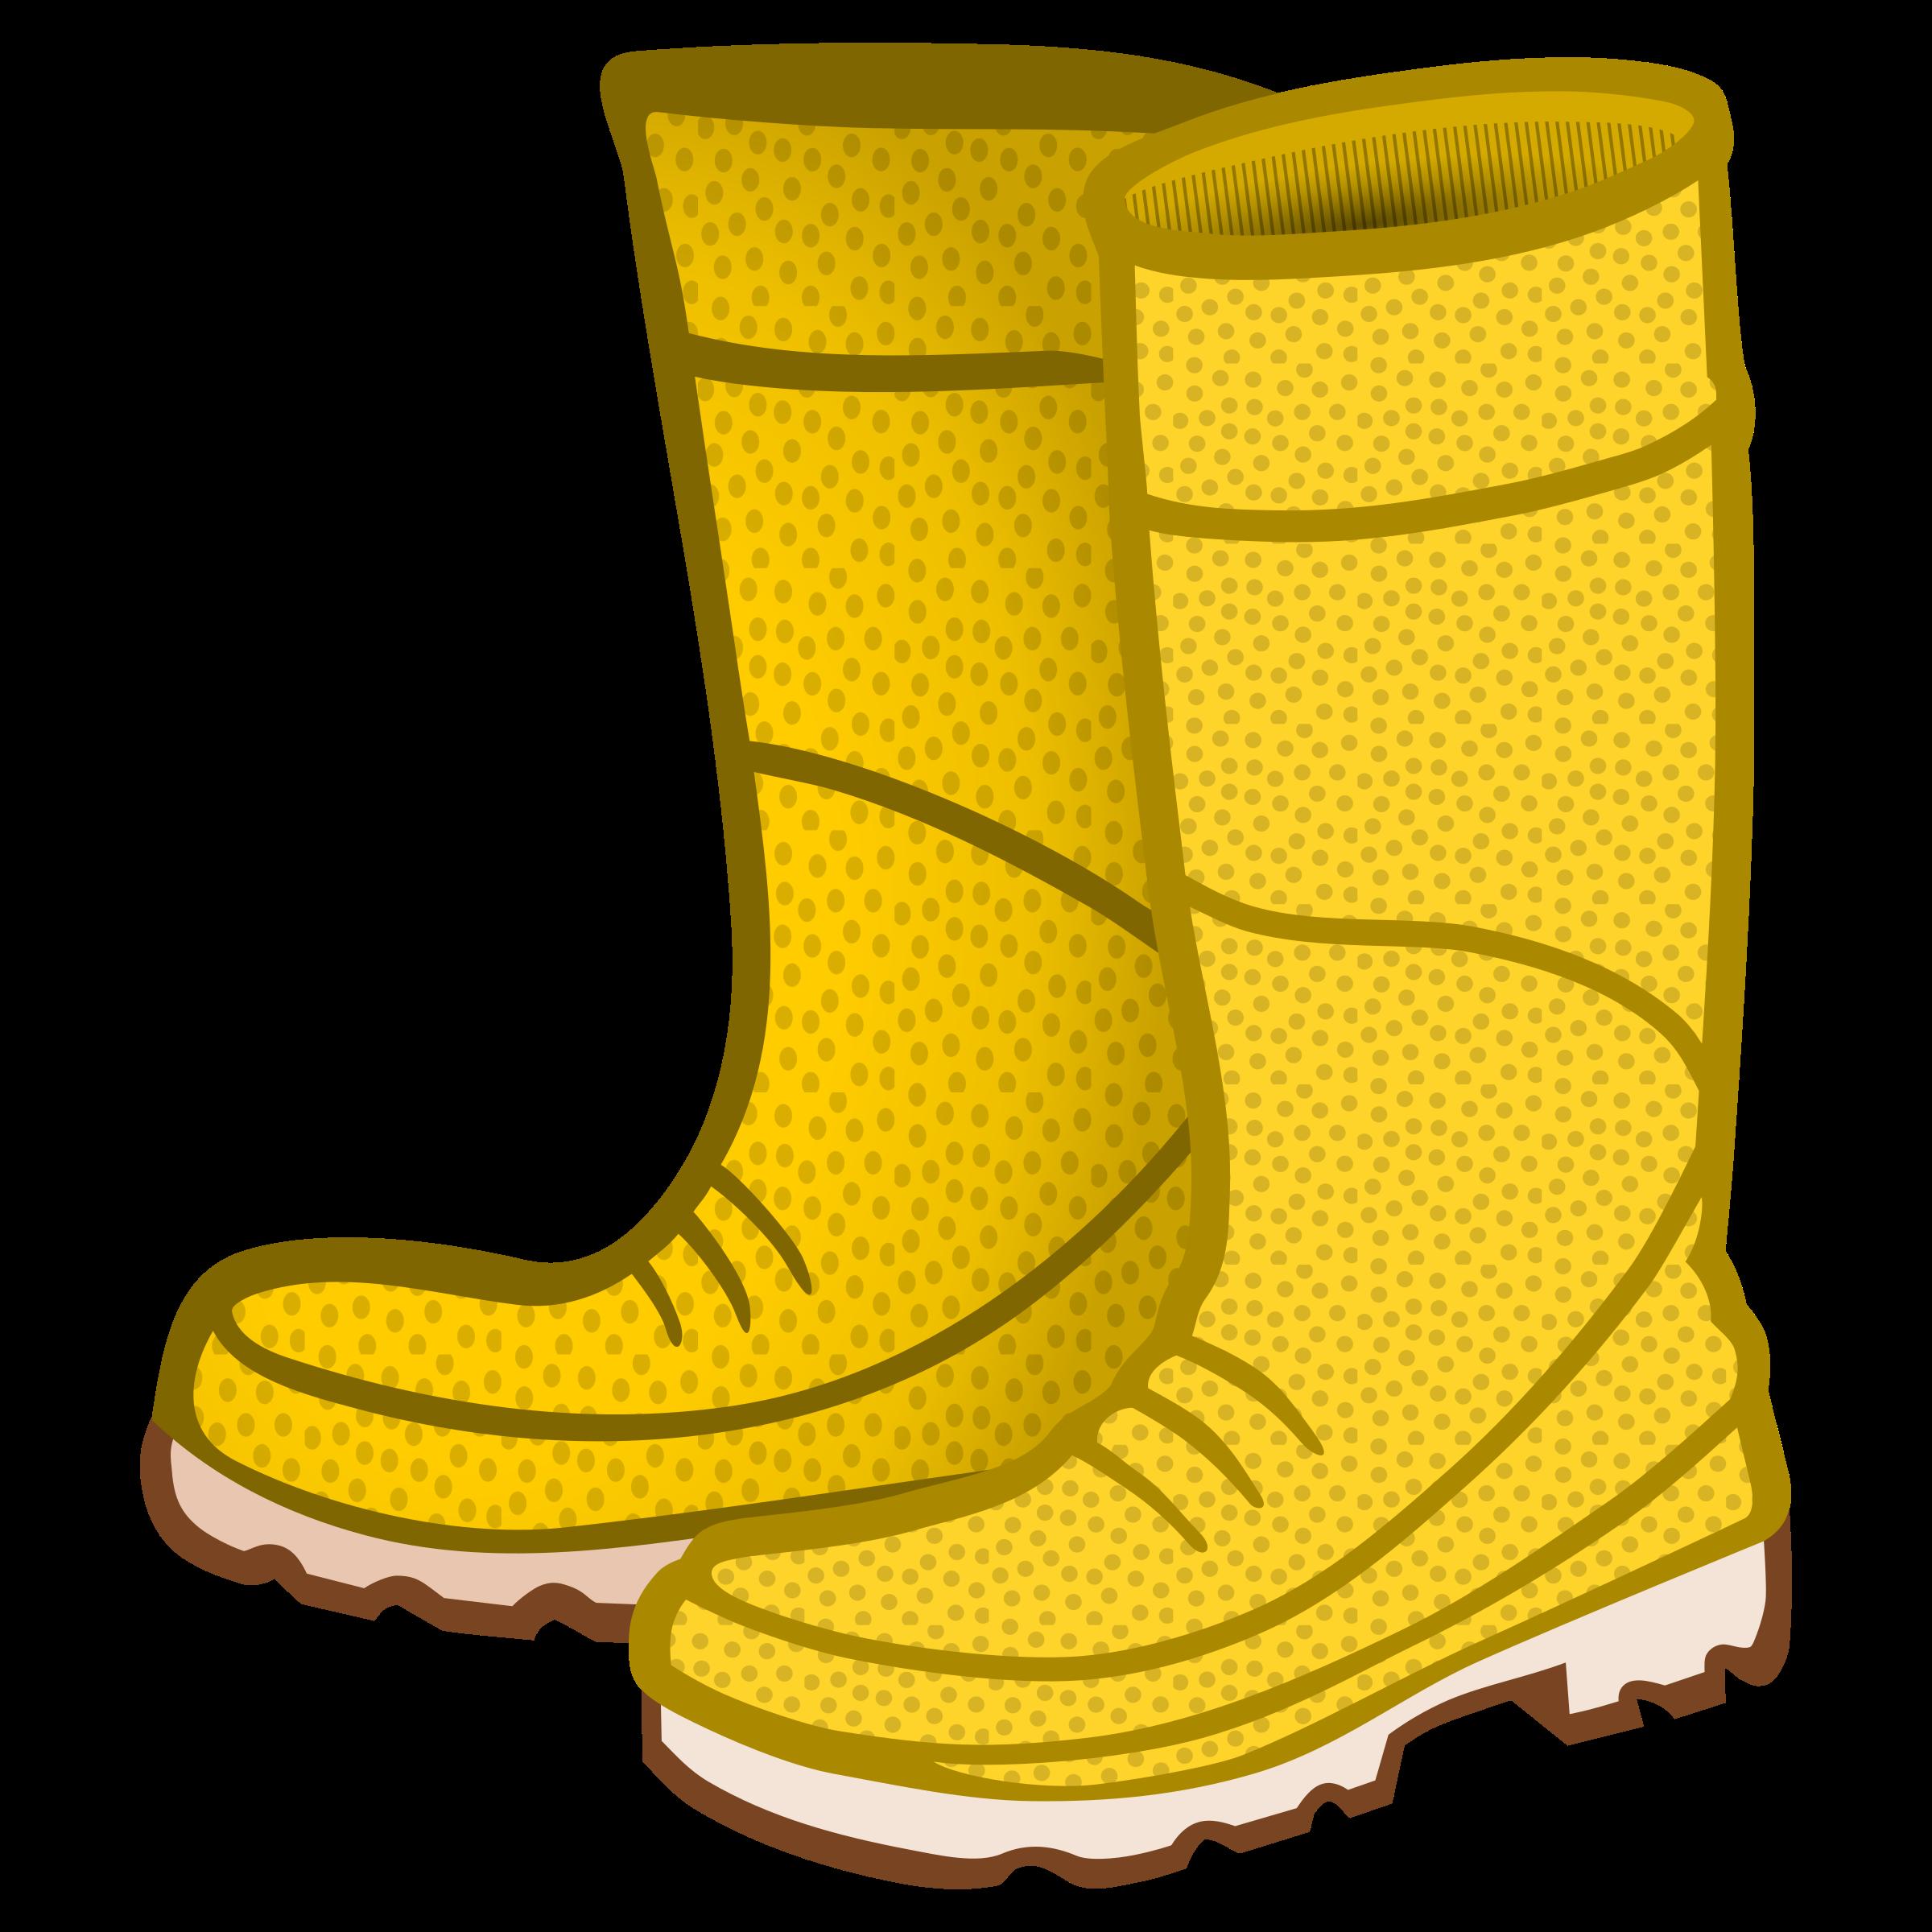 Rain boots clipart rubber boots coloured.